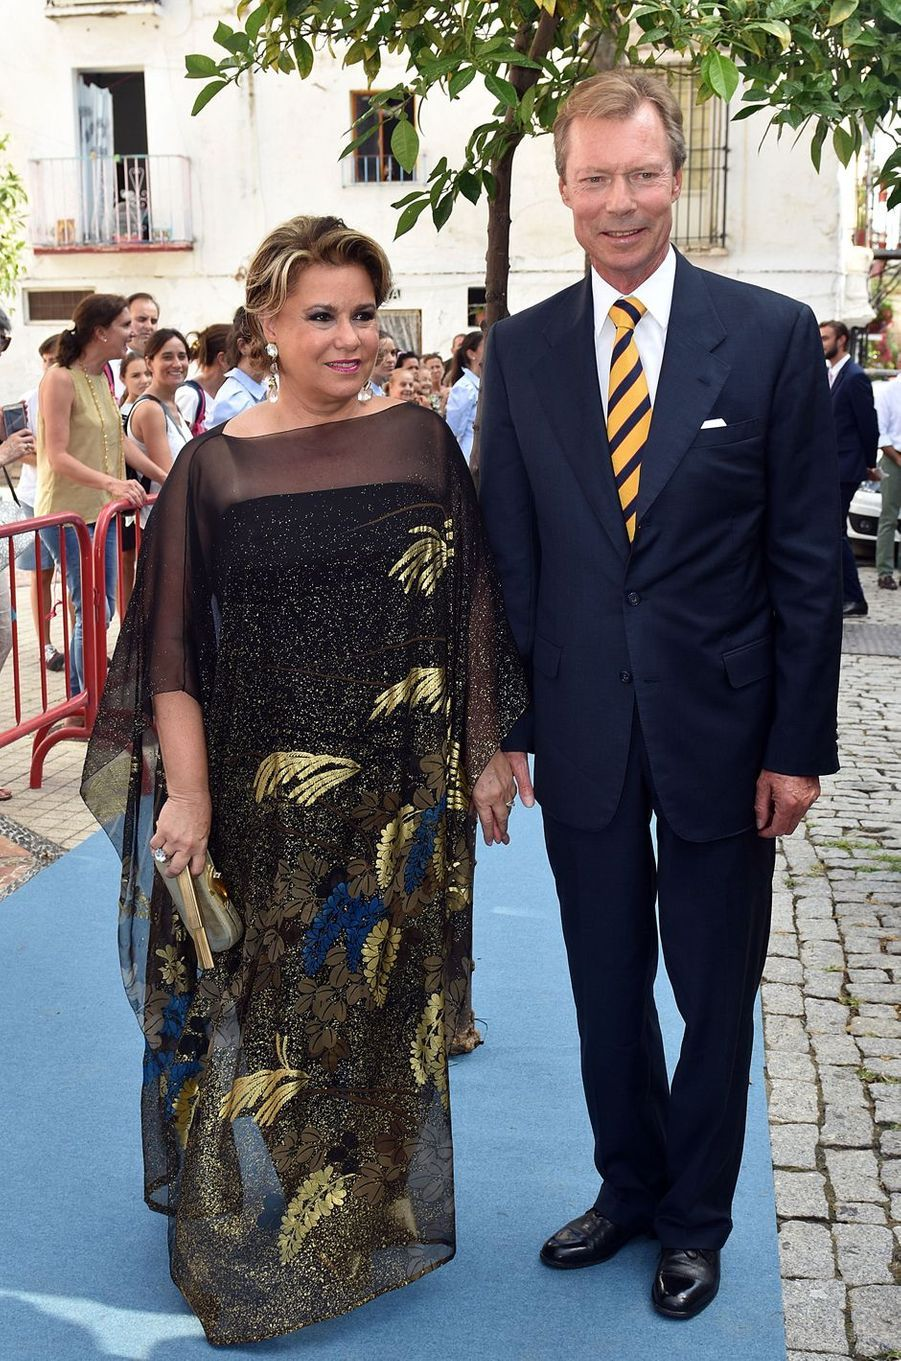 La grande-duchesse Maria Teresa de Luxembourg avec son mari le grand-duc Henri à Marbella, le 2 septembre 2017